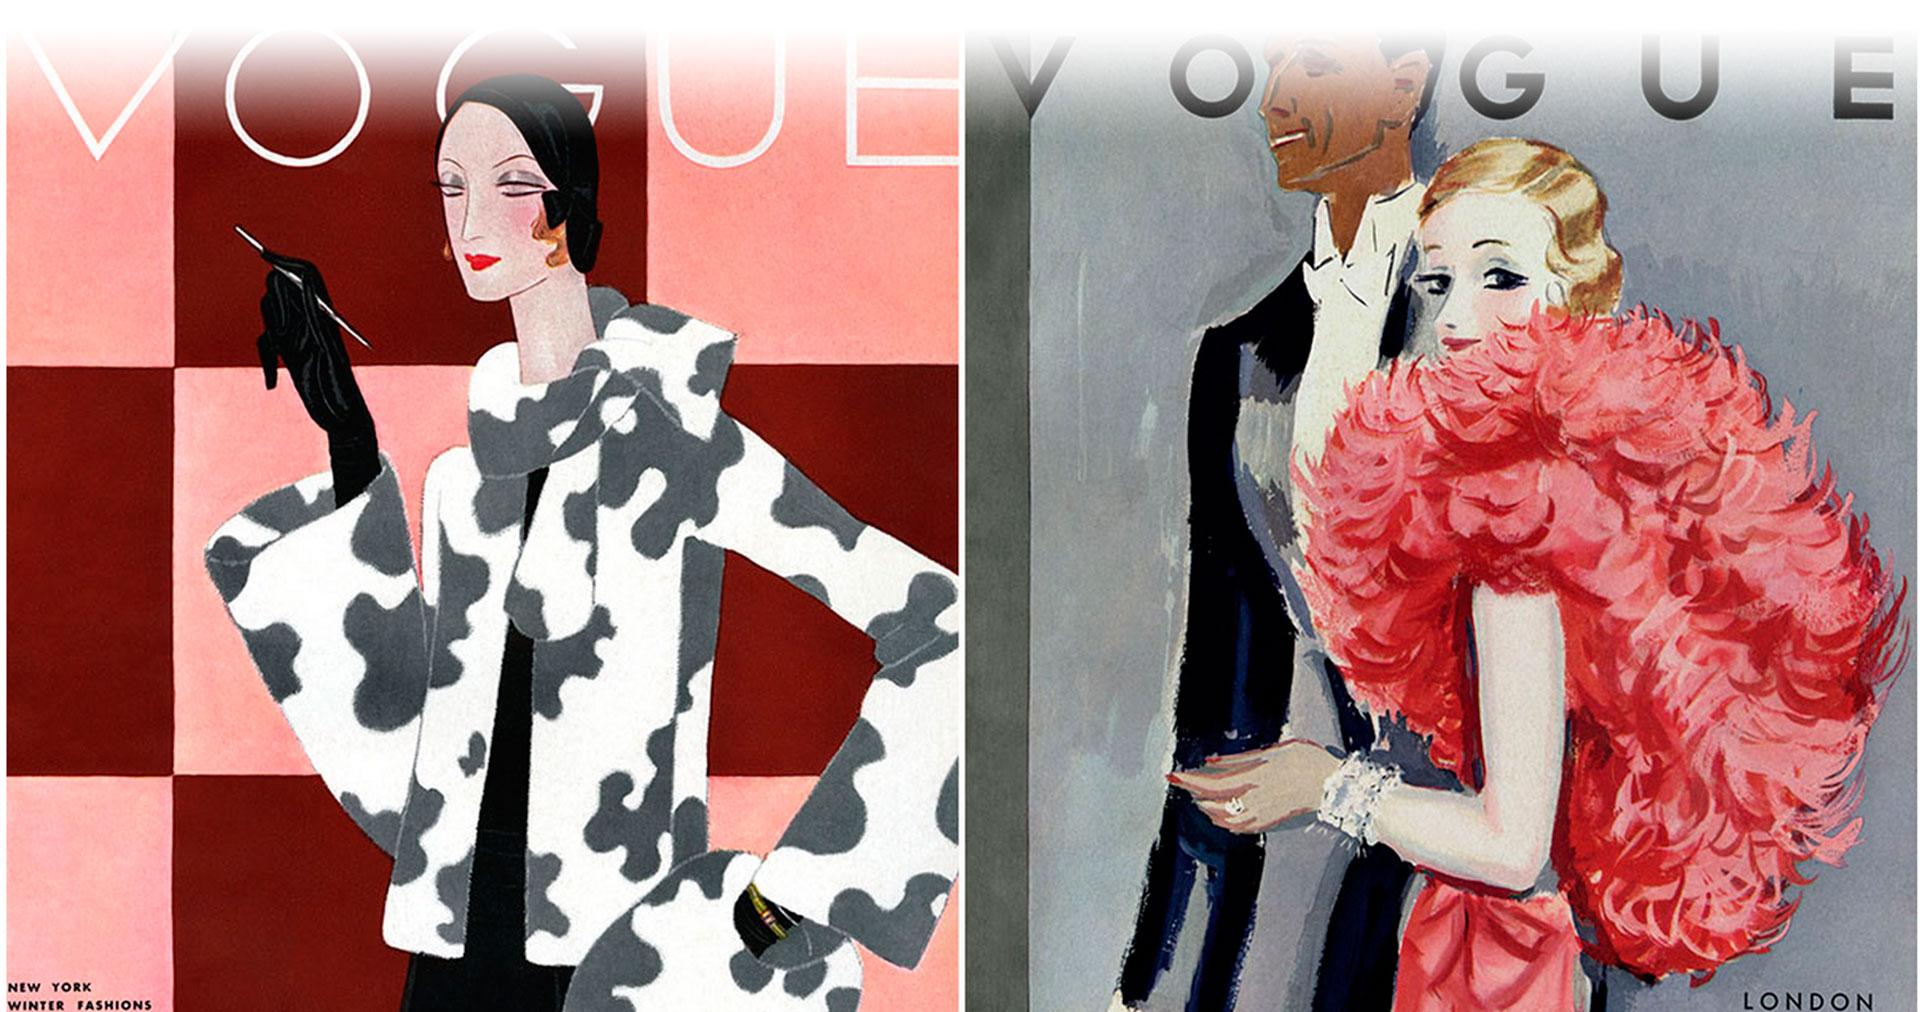 La mirada de Vogue. Revista de moda